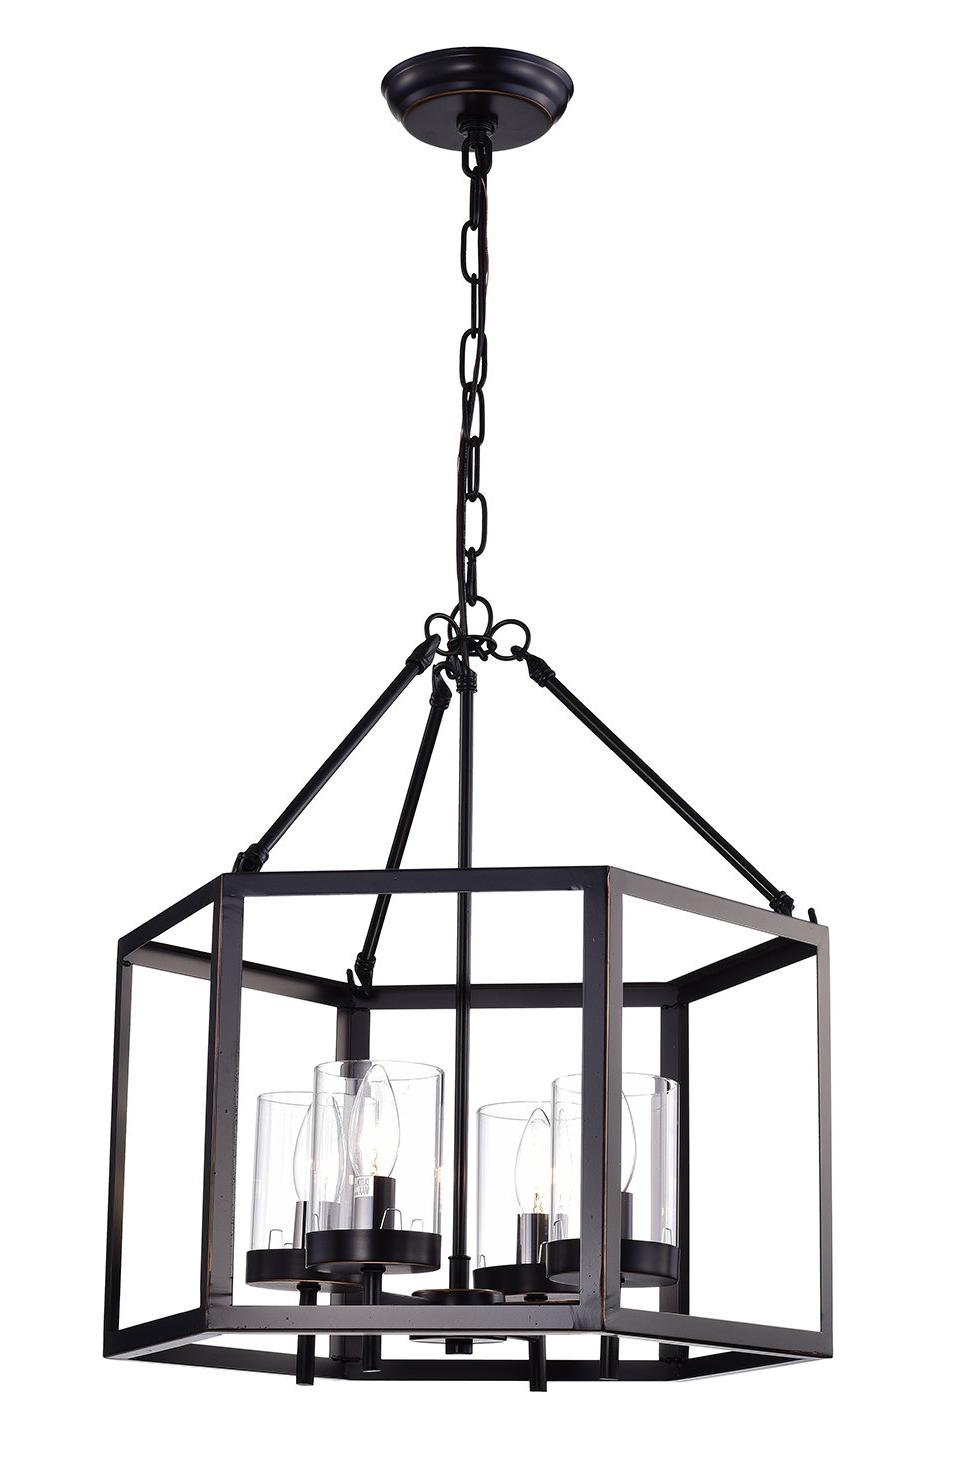 Thorne 6 Light Lantern Square / Rectangle Pendants Regarding 2019 Gracie Oaks Liberty Street 4 Light Lantern Geometric Pendant (View 16 of 25)